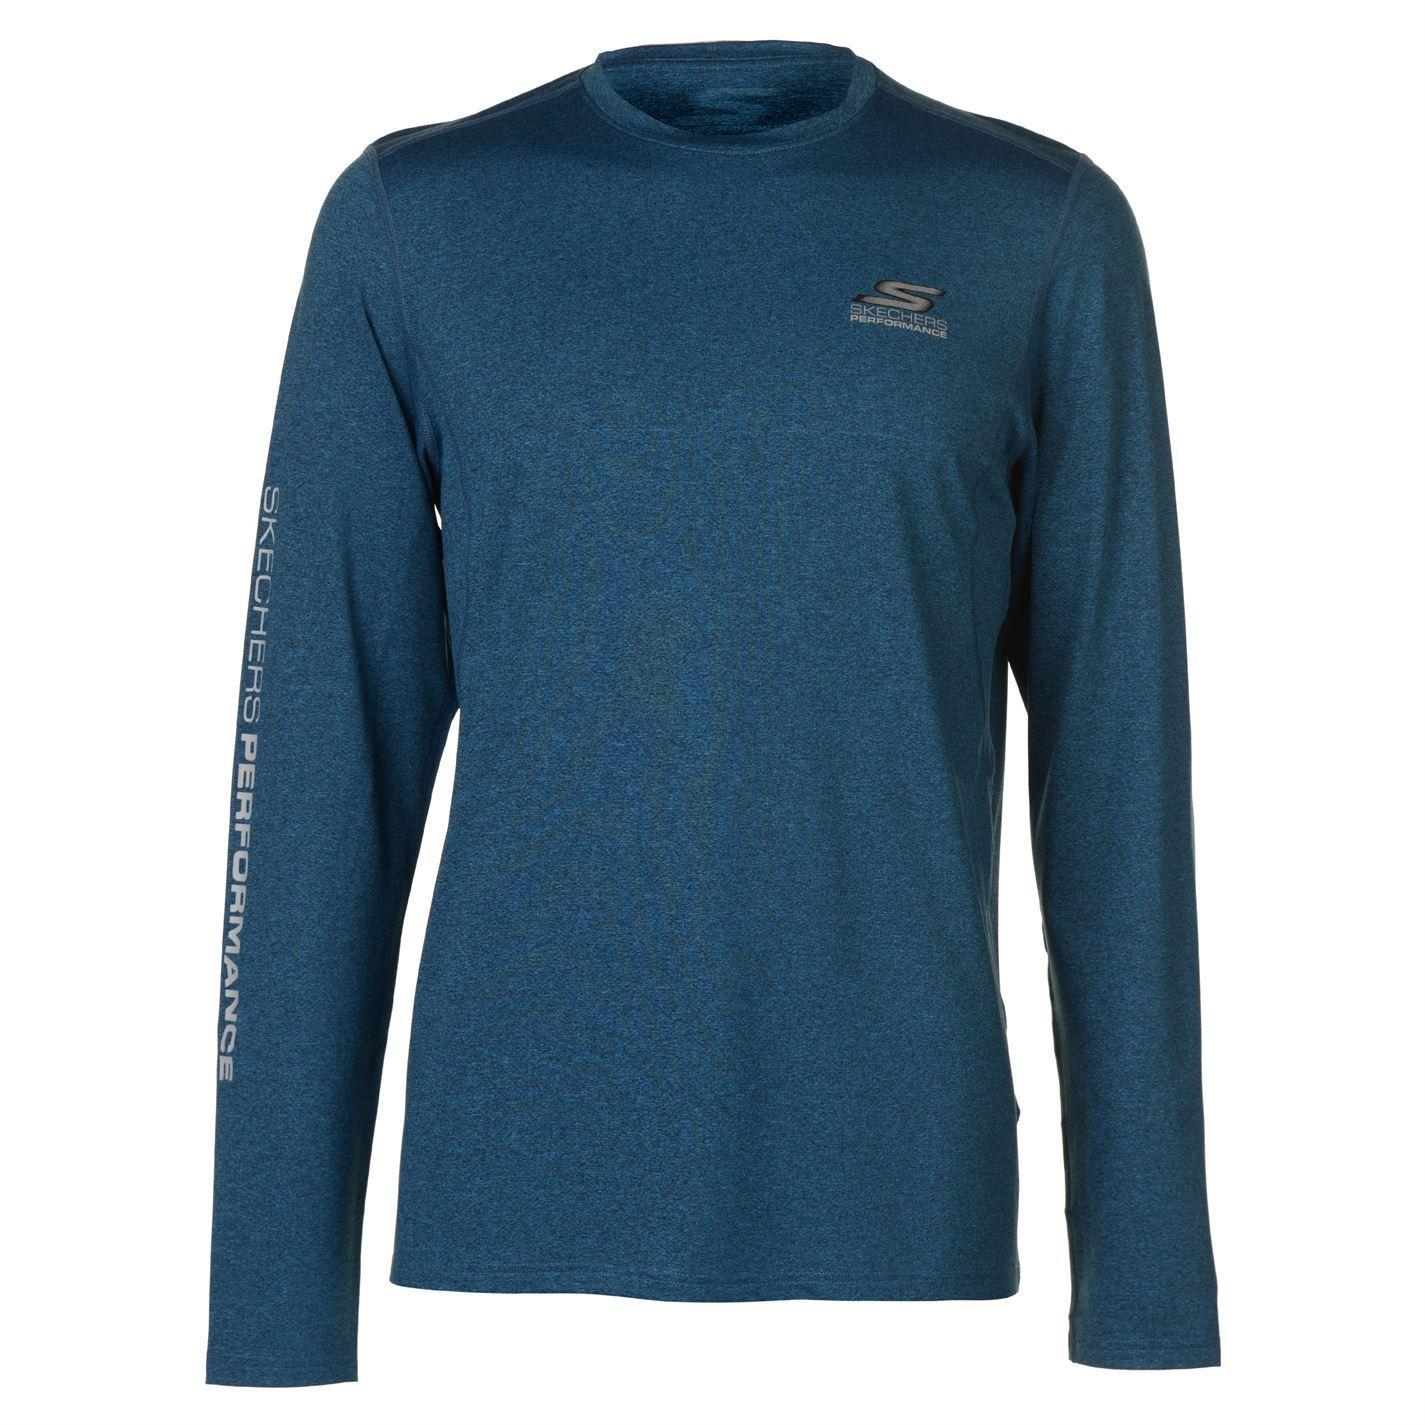 Skechers-Mens-Spin-Camiseta-mangas-largas-Top-de-cuello-redondo-impresion-de-bloque-ligero miniatura 3